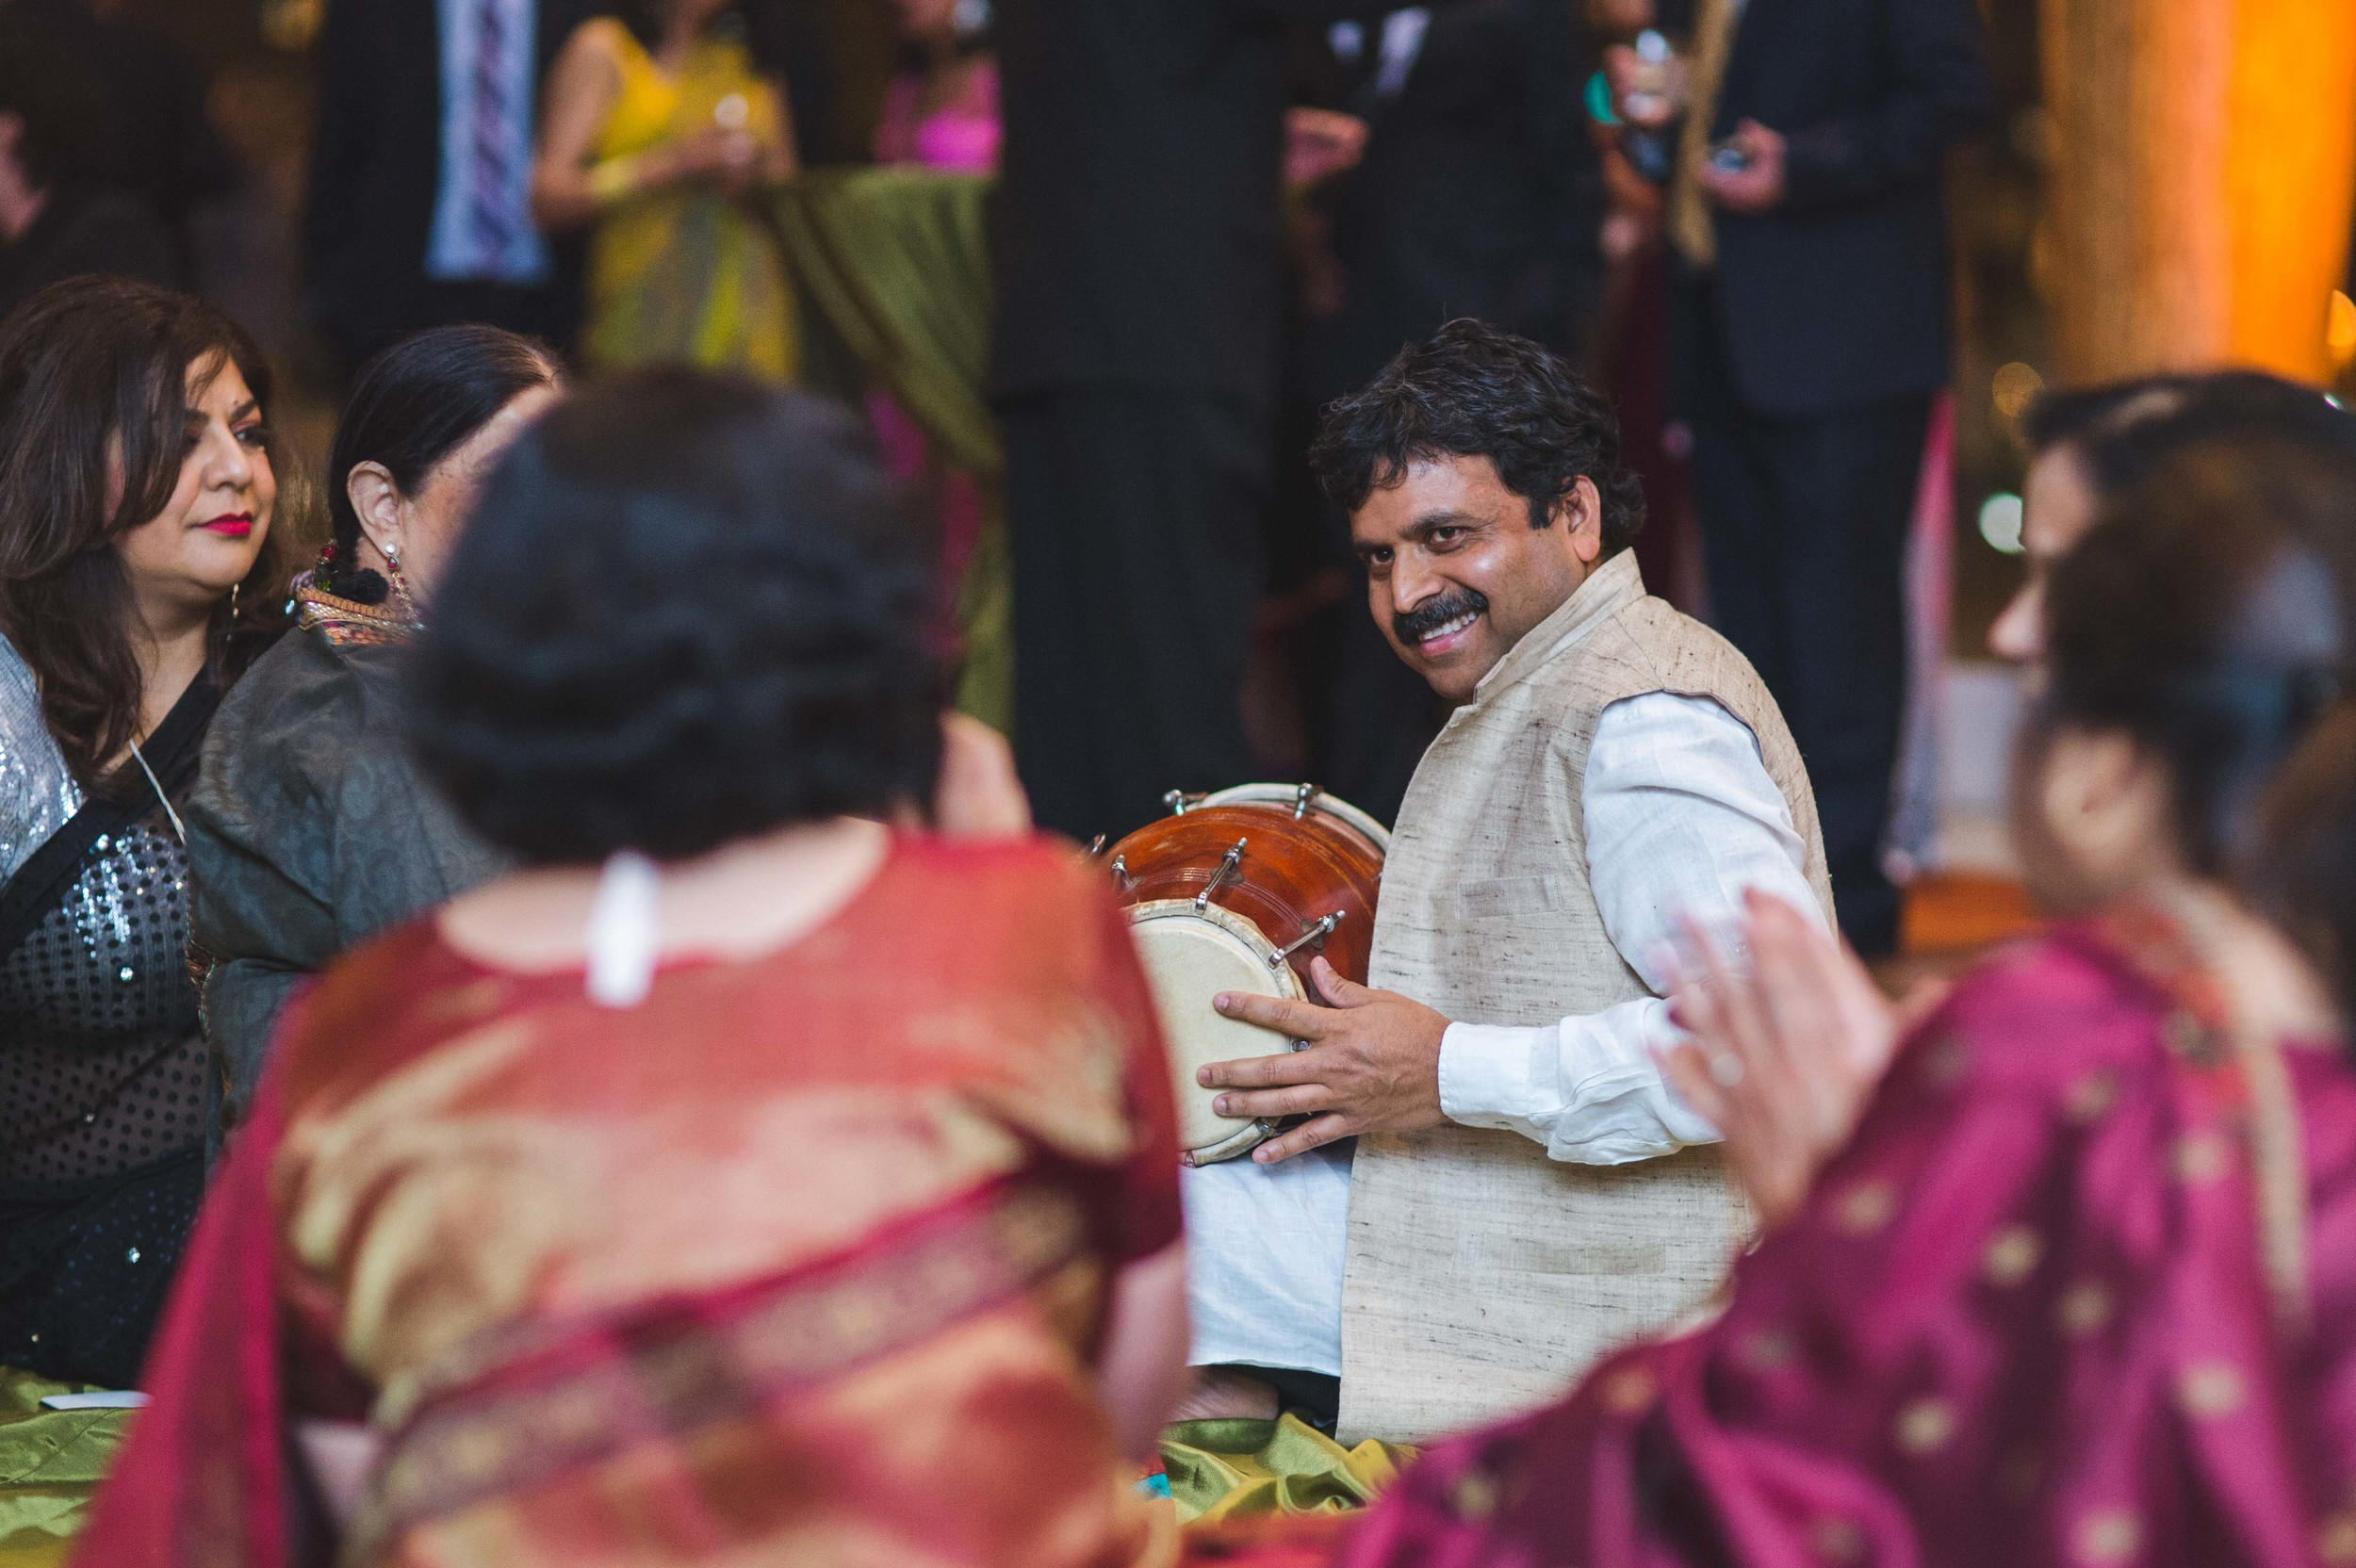 Indian Pre-wedding  at Arena Stage Washington DC by Mantas Kubilinskas-25.jpg